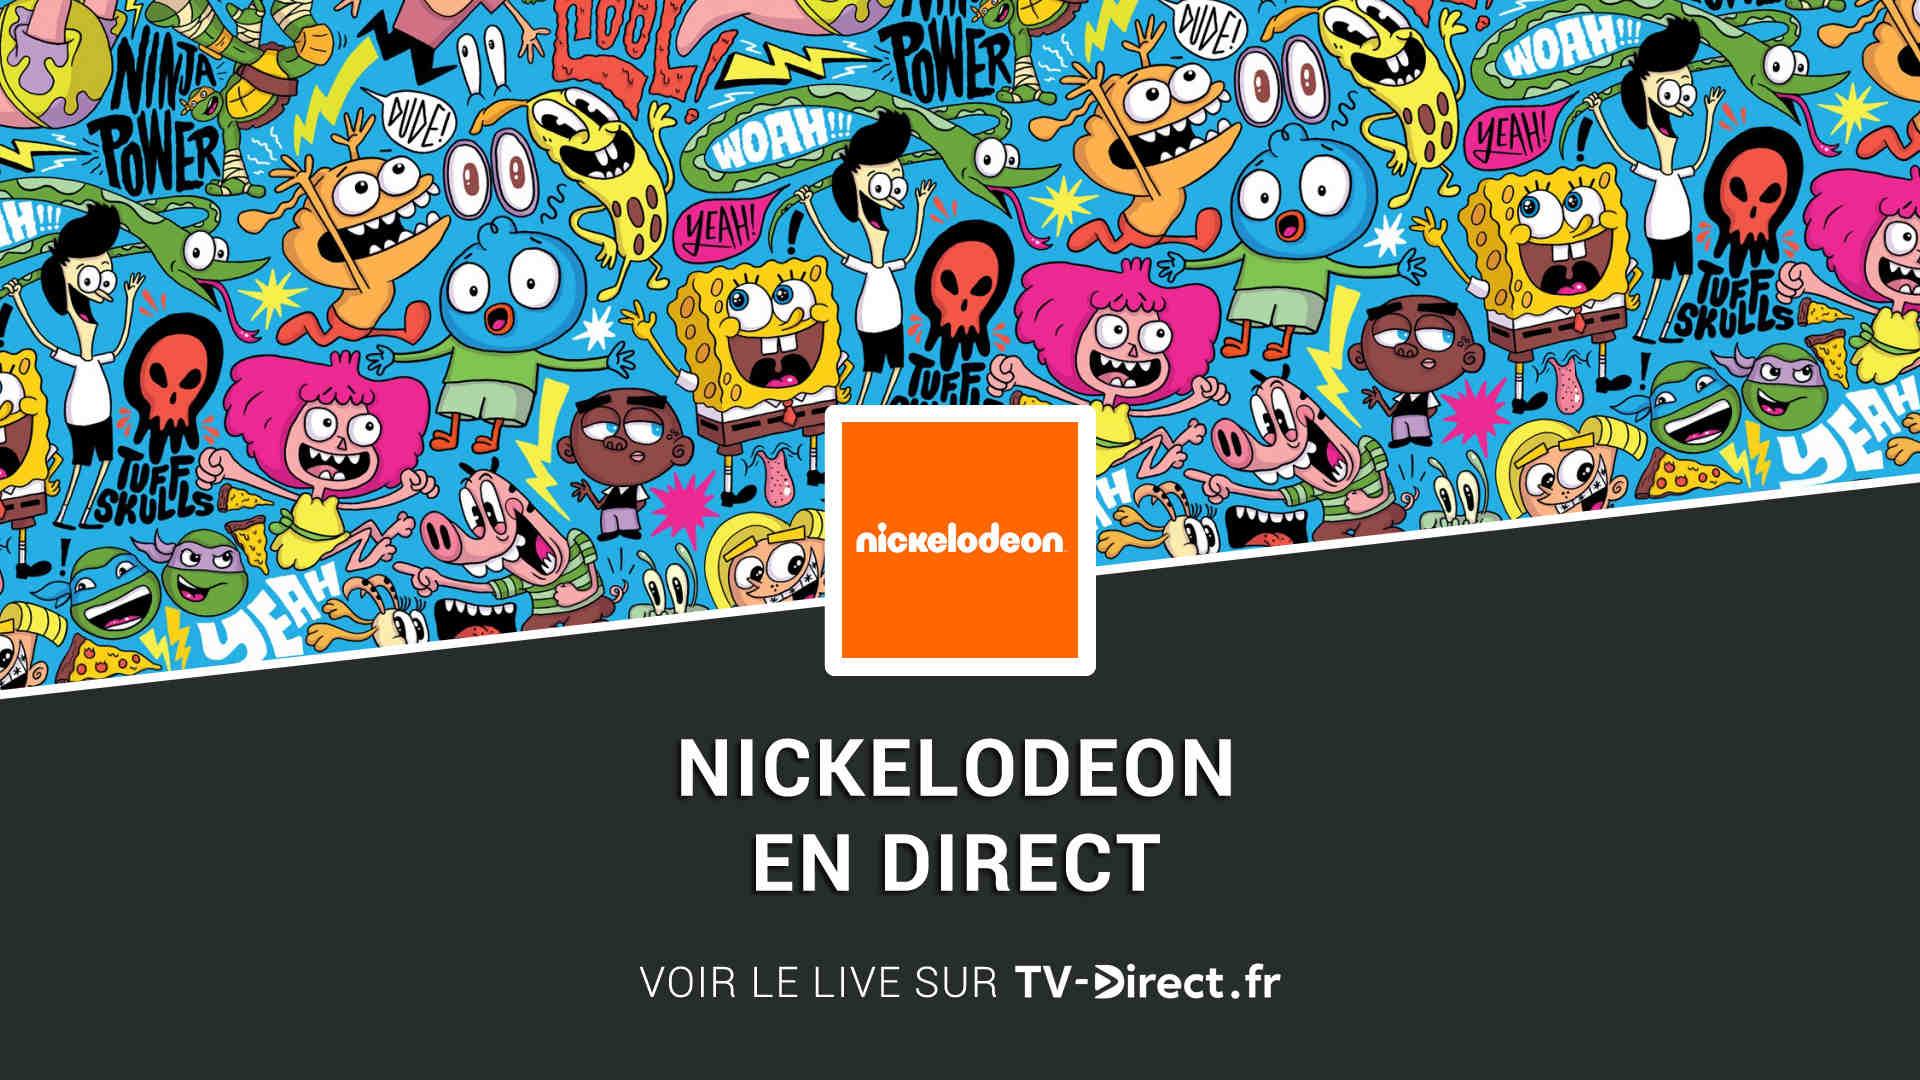 Pourquoi Nickelodeon?